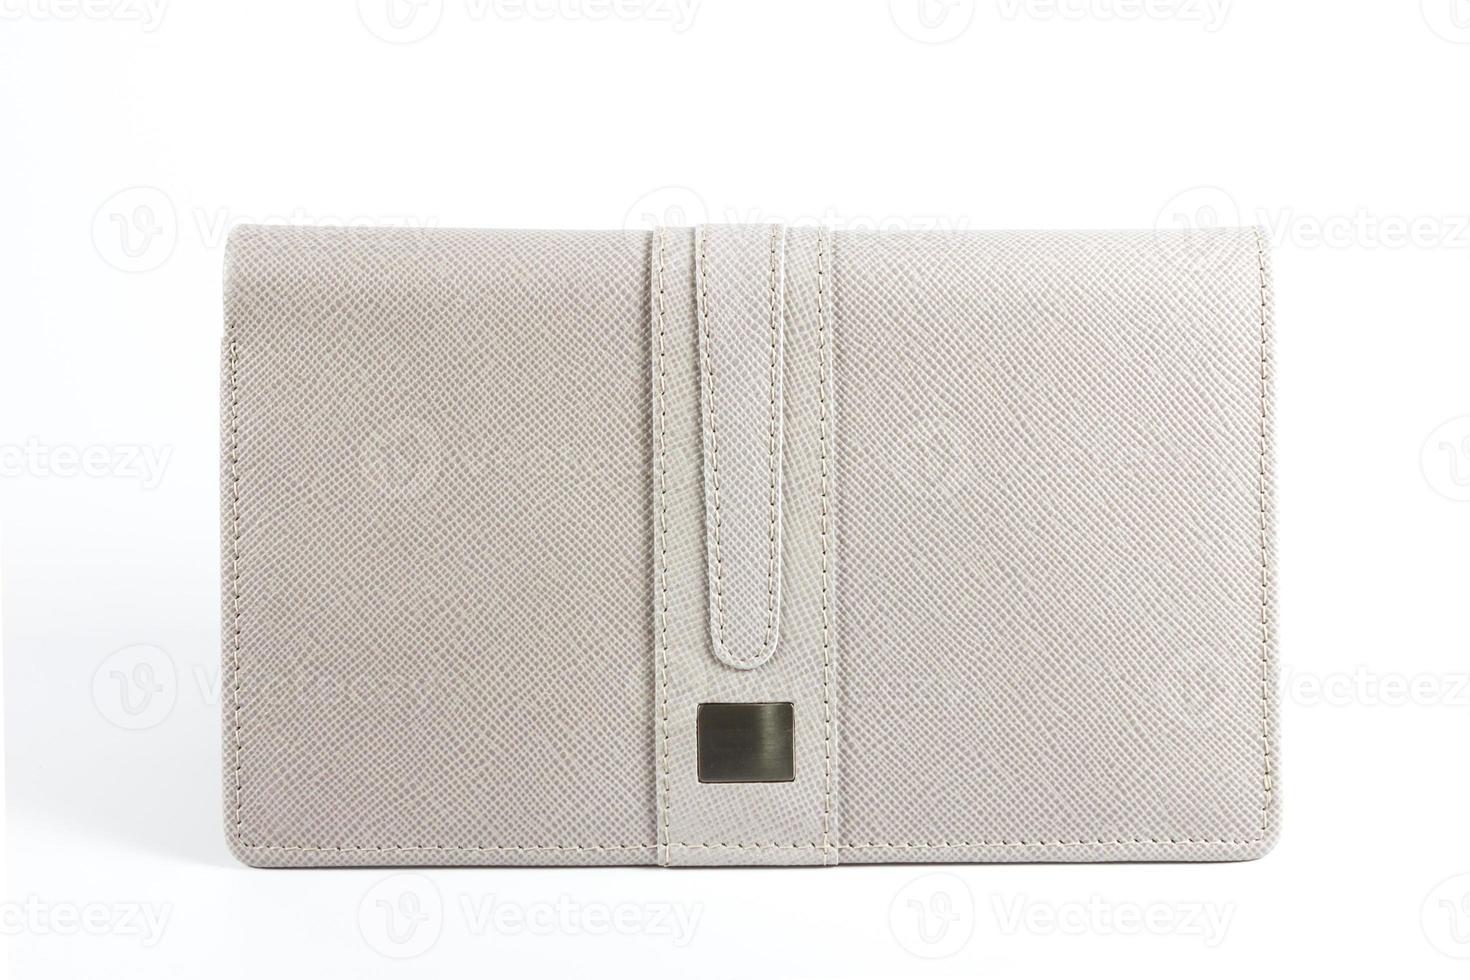 Female white purse photo